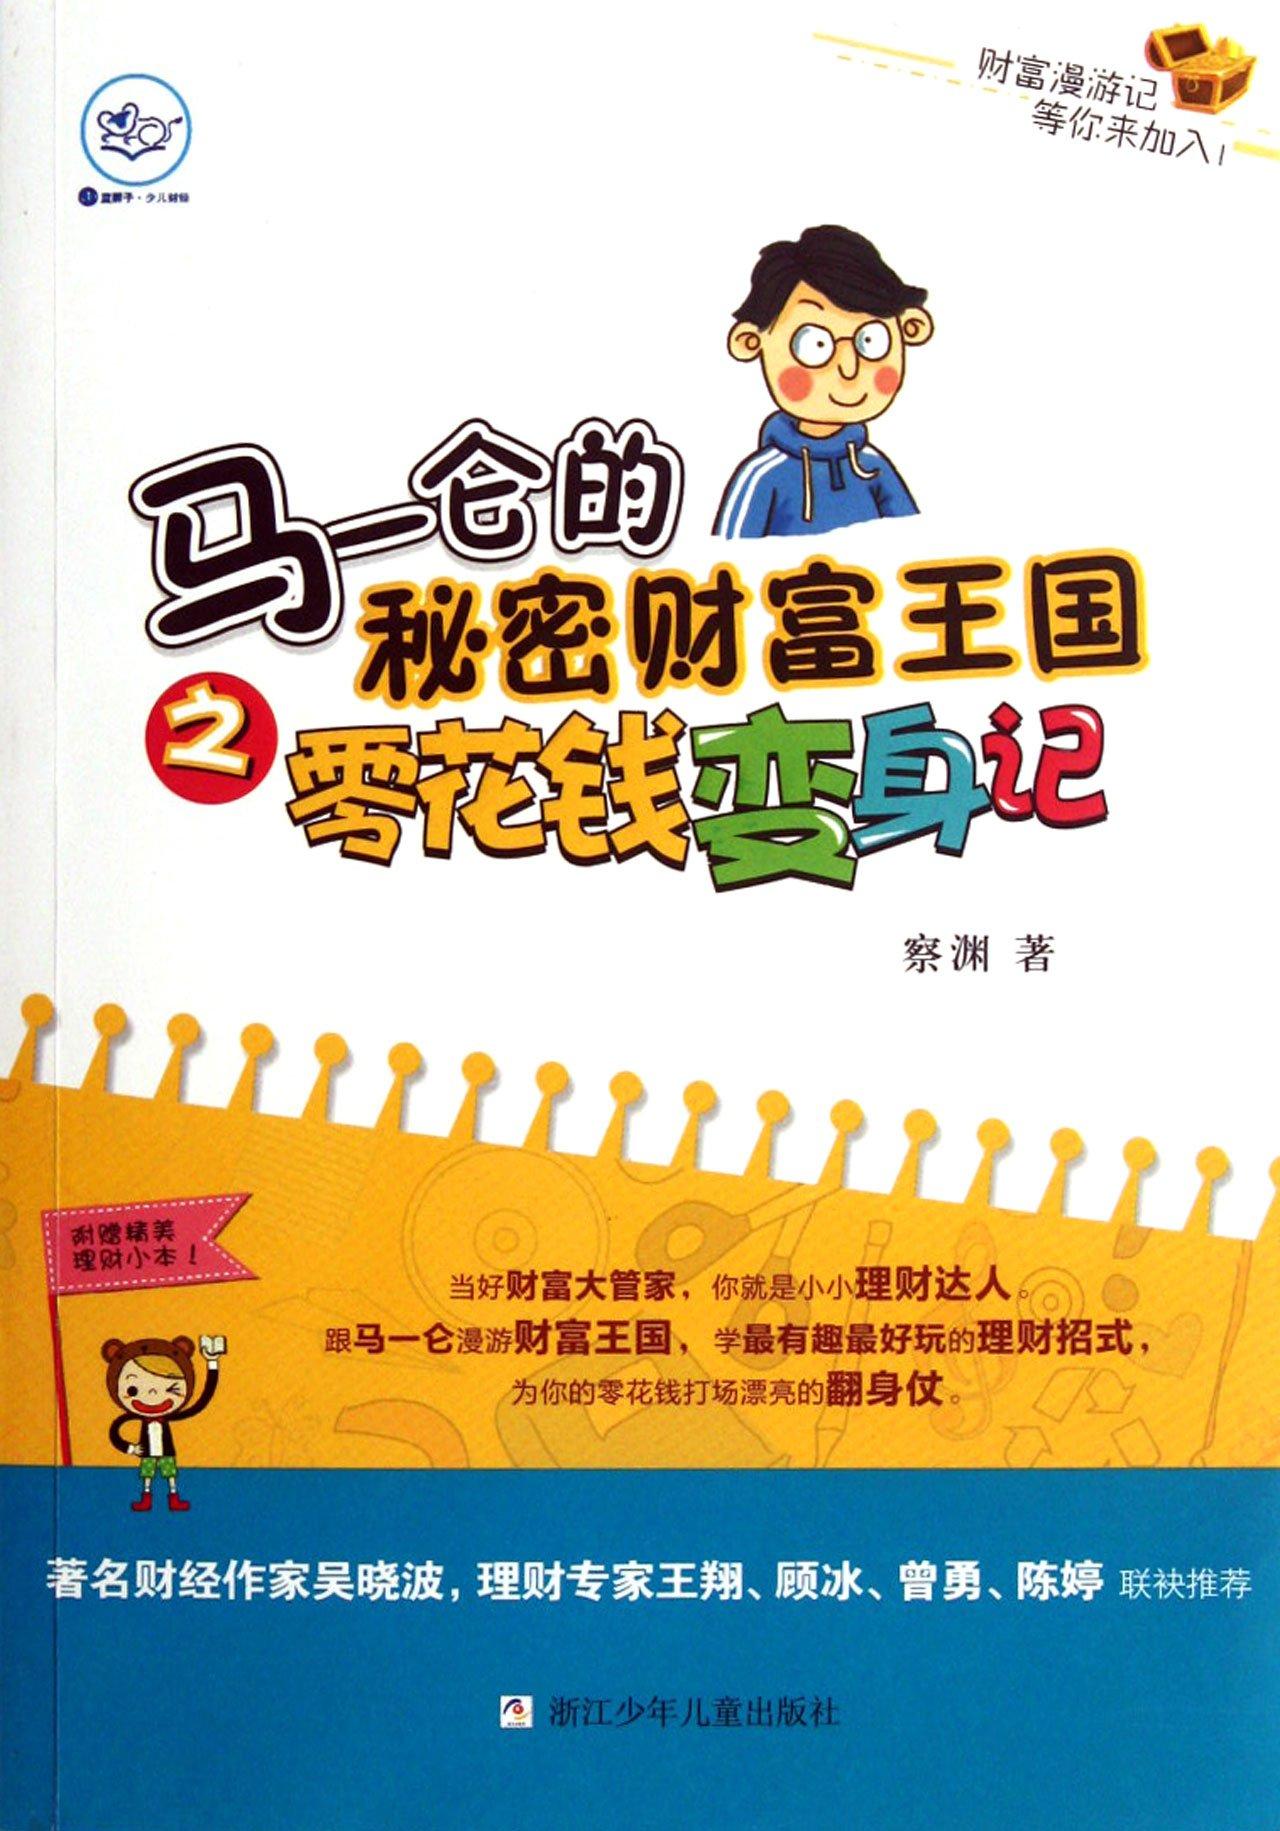 Ma Yiluns Secret Treasure Kingdom: Tales of Pocket Money (Chinese Edition) pdf